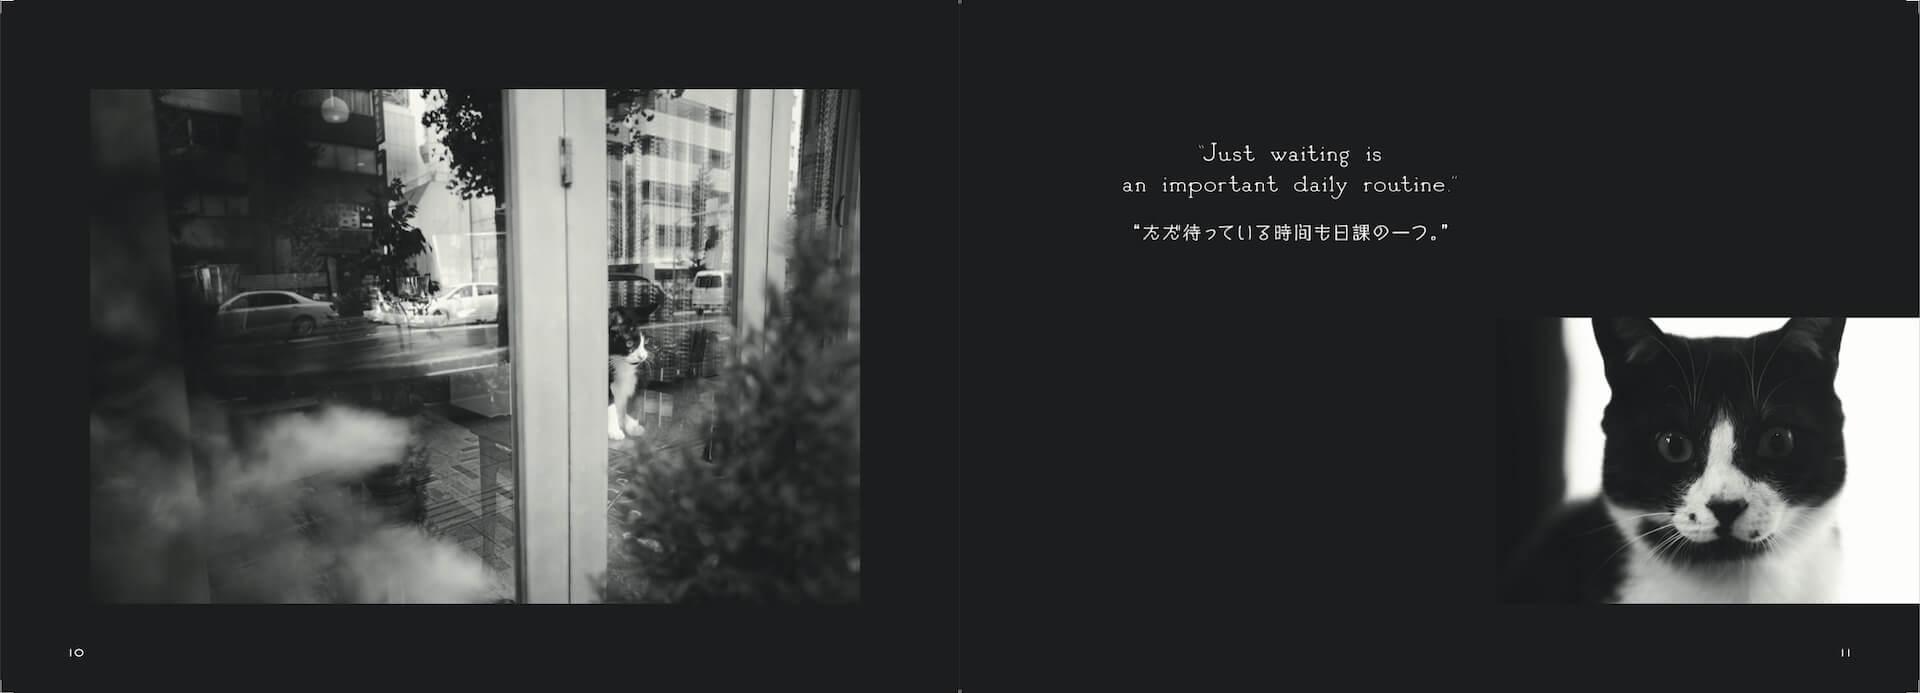 写真集『猫と喫茶店』が発売|「珈琲時間」人気連載の書籍化 art191021_catandcafe_sub2